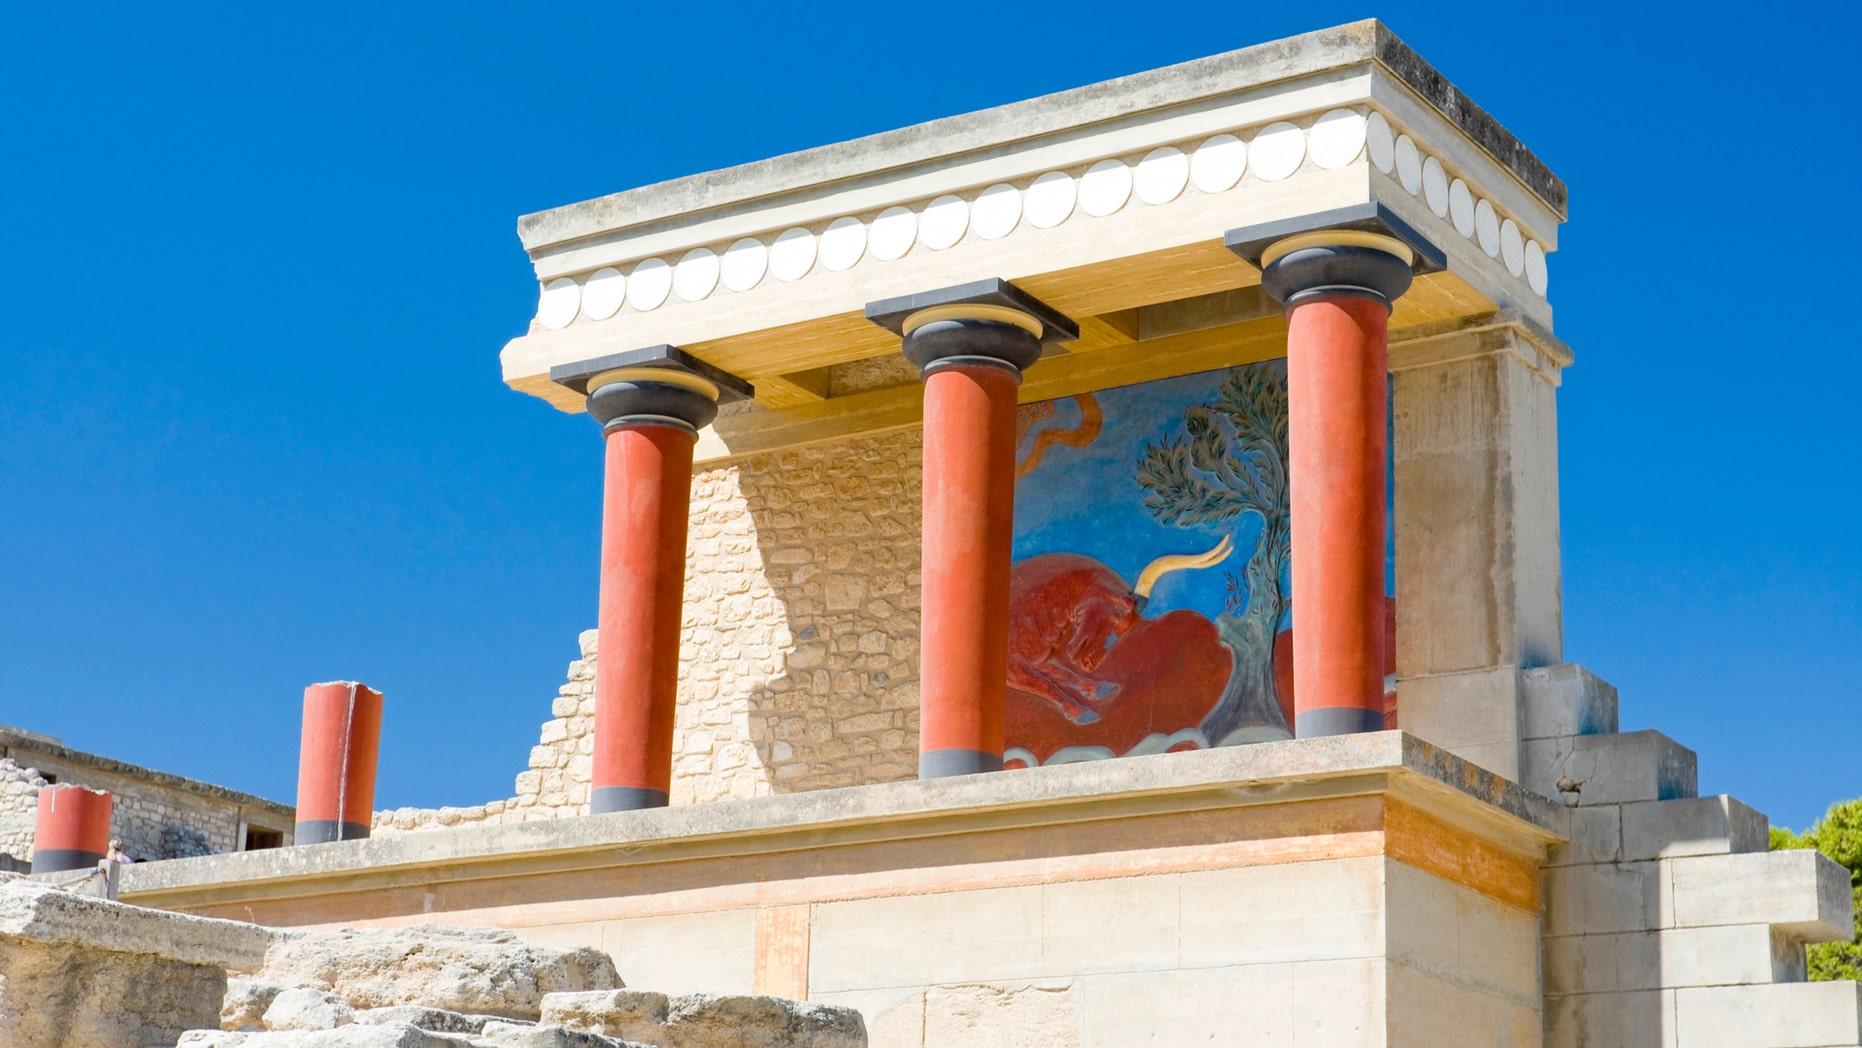 North gate at Knossos palace, Crete, Greece, iStock